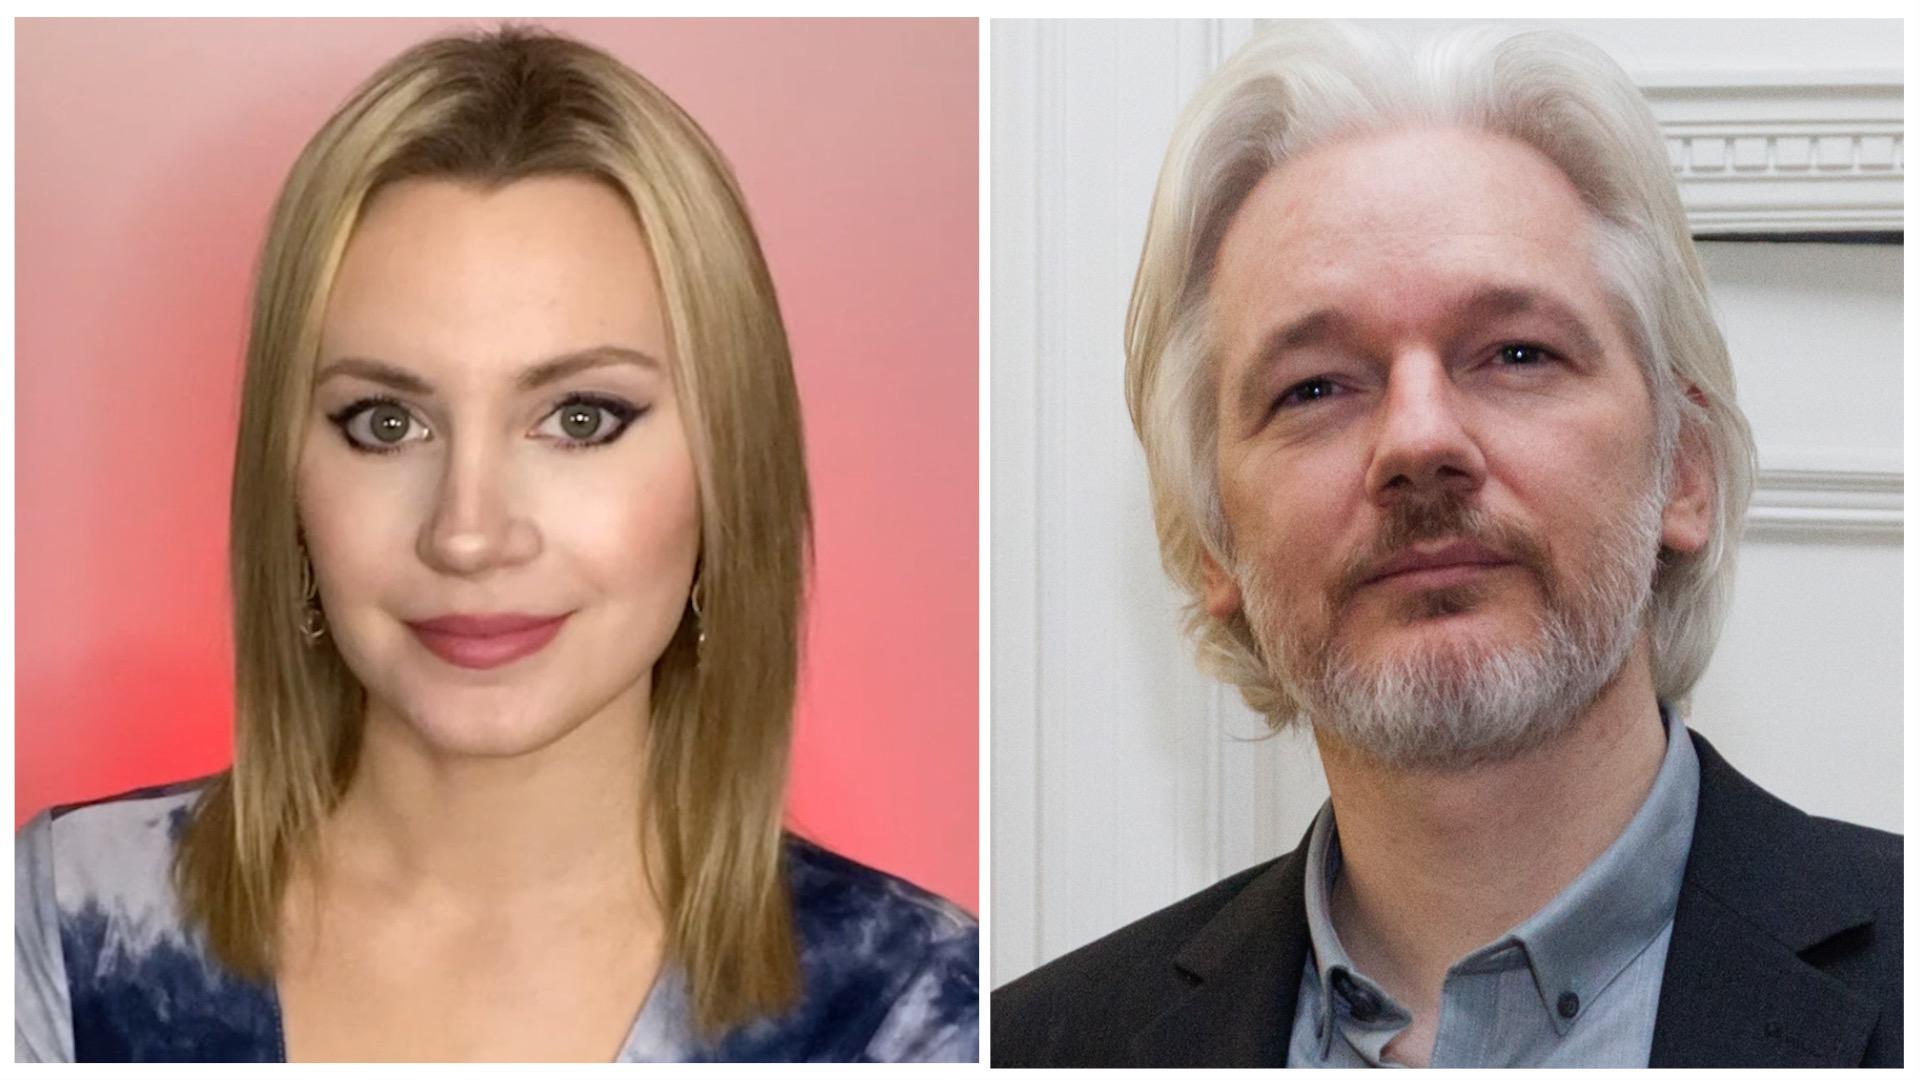 Assange Update: Shocking Prison Conditions & Biden Admin Appeals Extradition Ruling